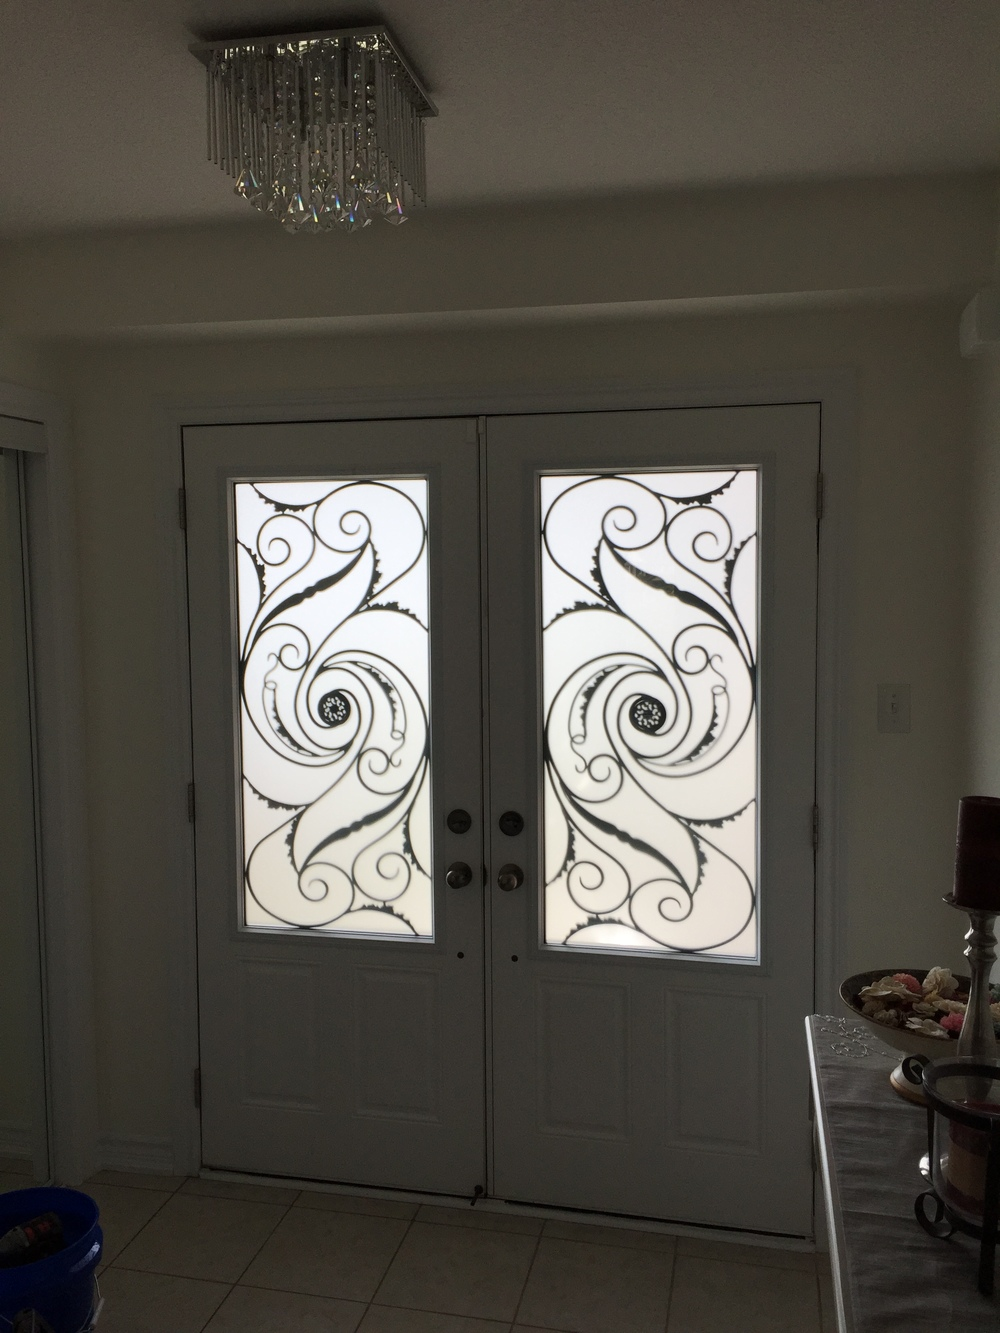 Port-Union-Wrought-Iron-Glass-Door-Inserts-Concord-Ontario